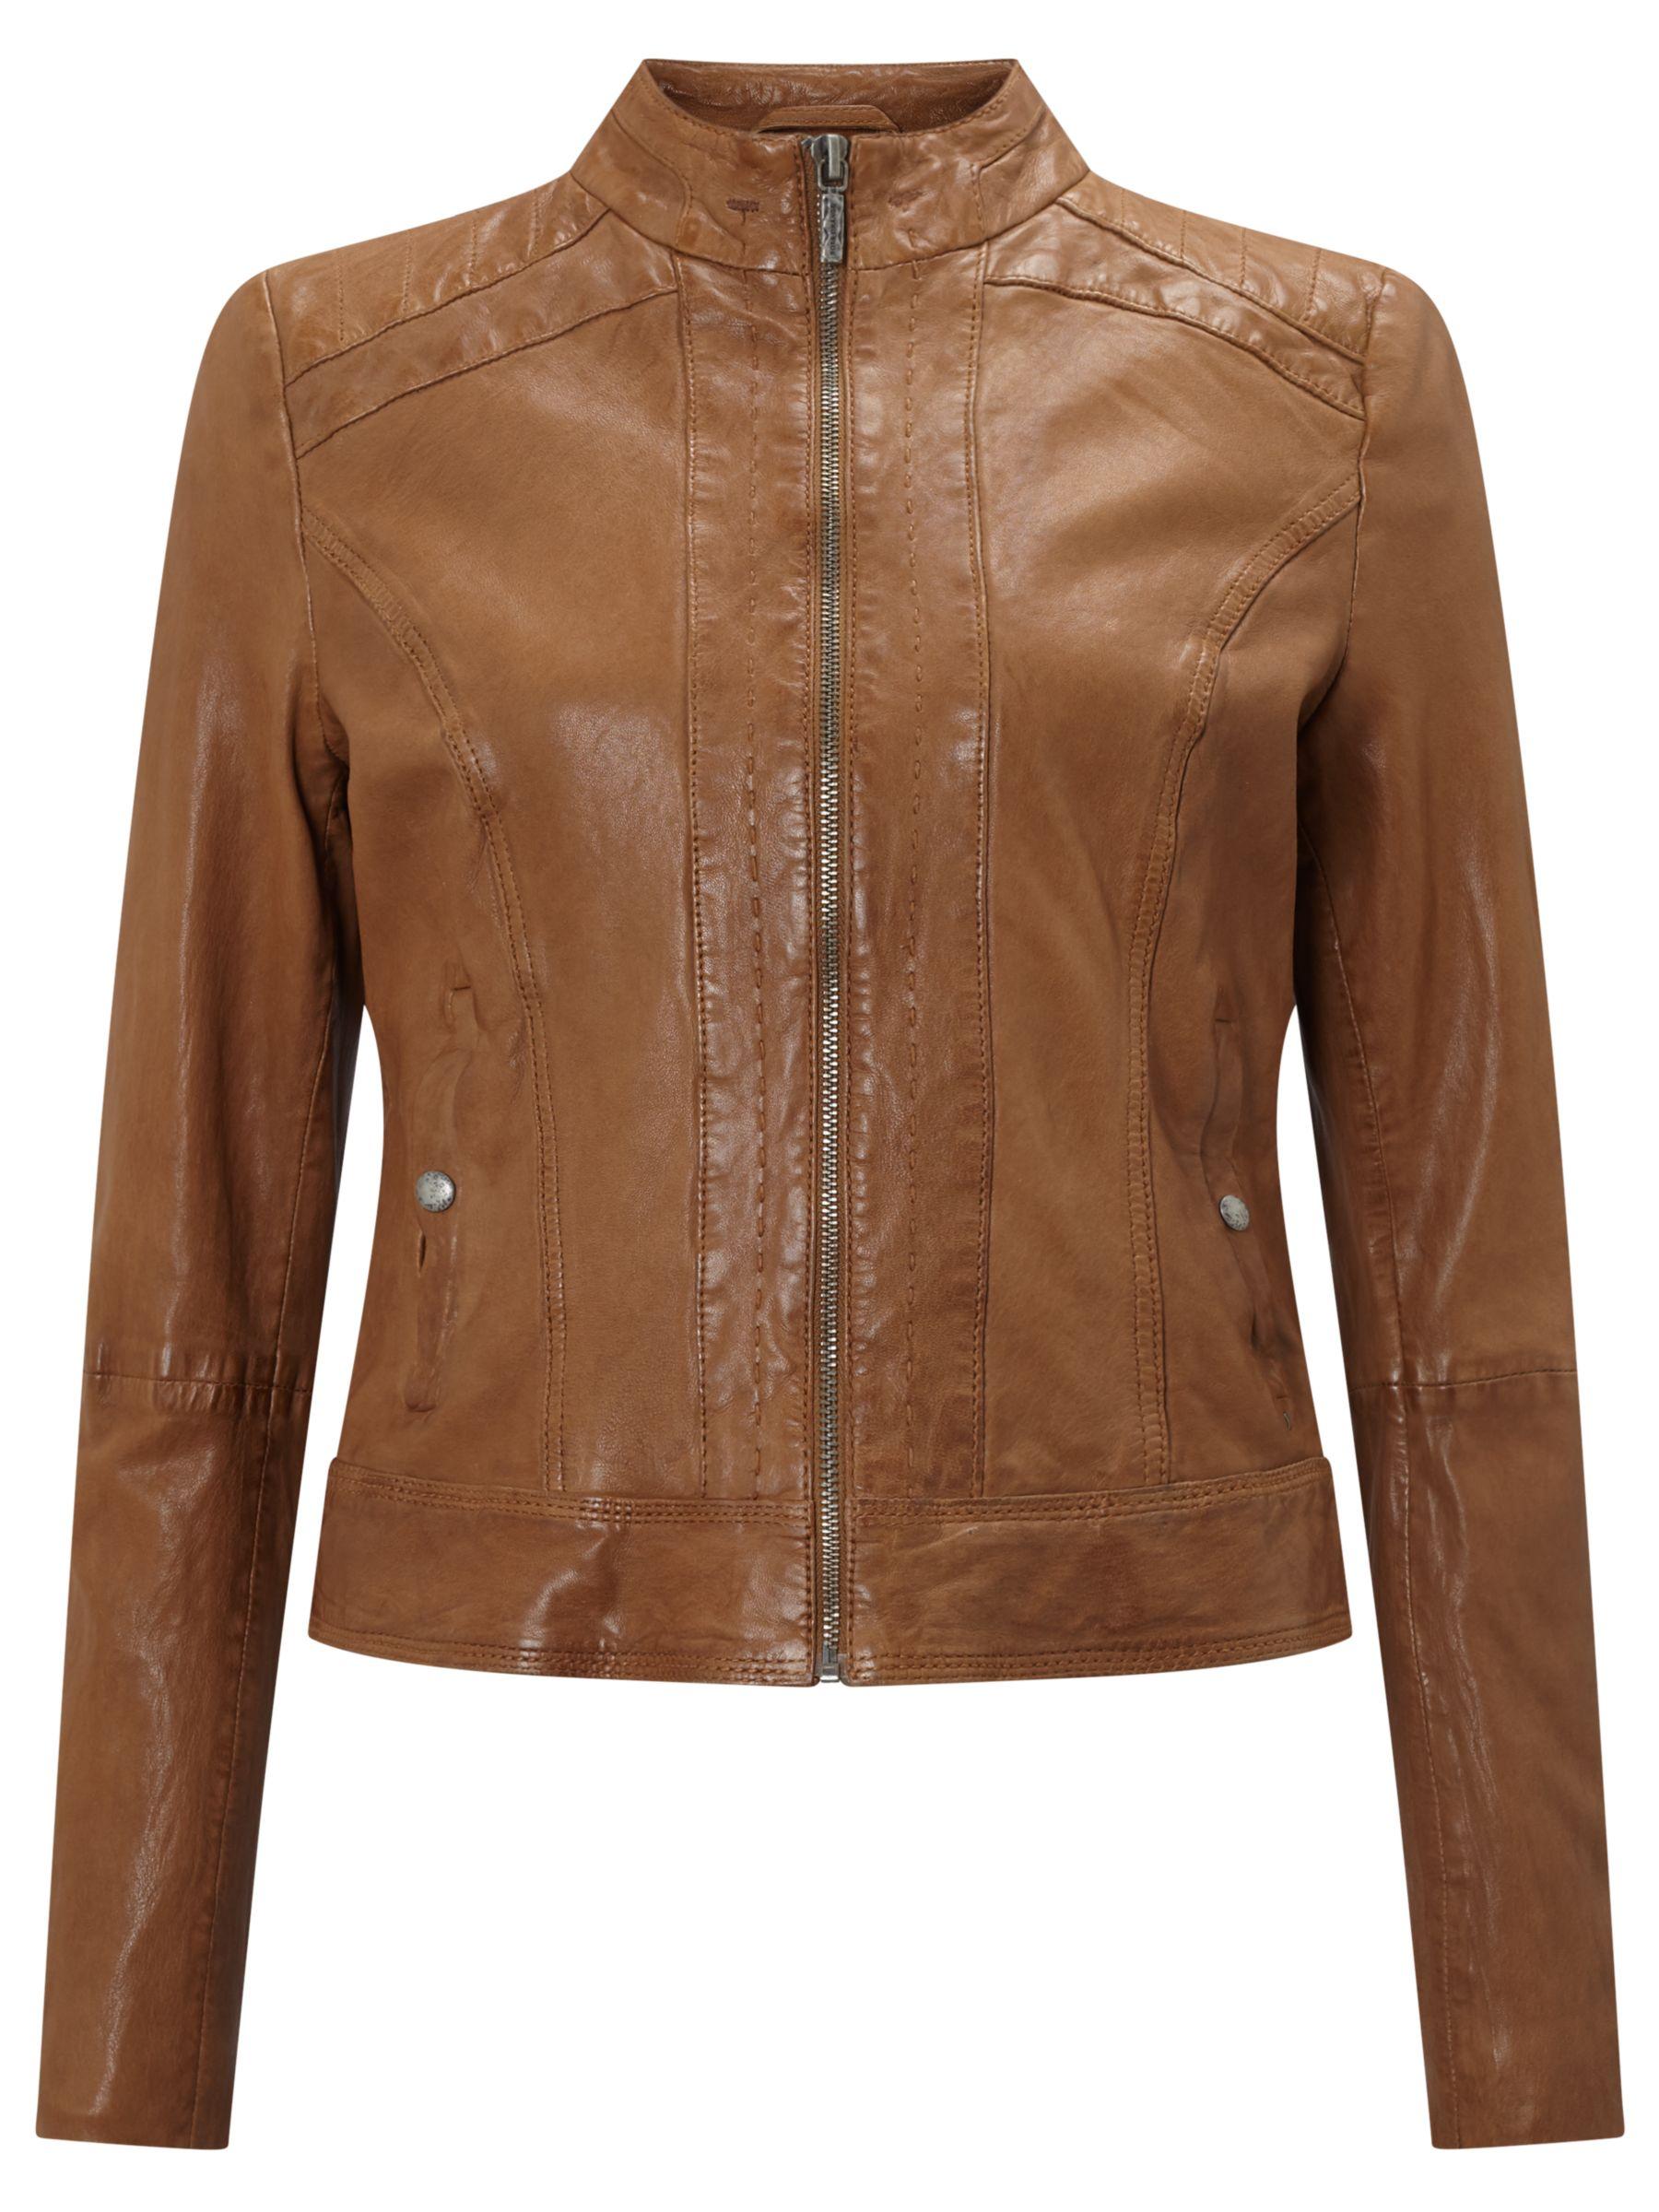 hugo boss tan leather jacket